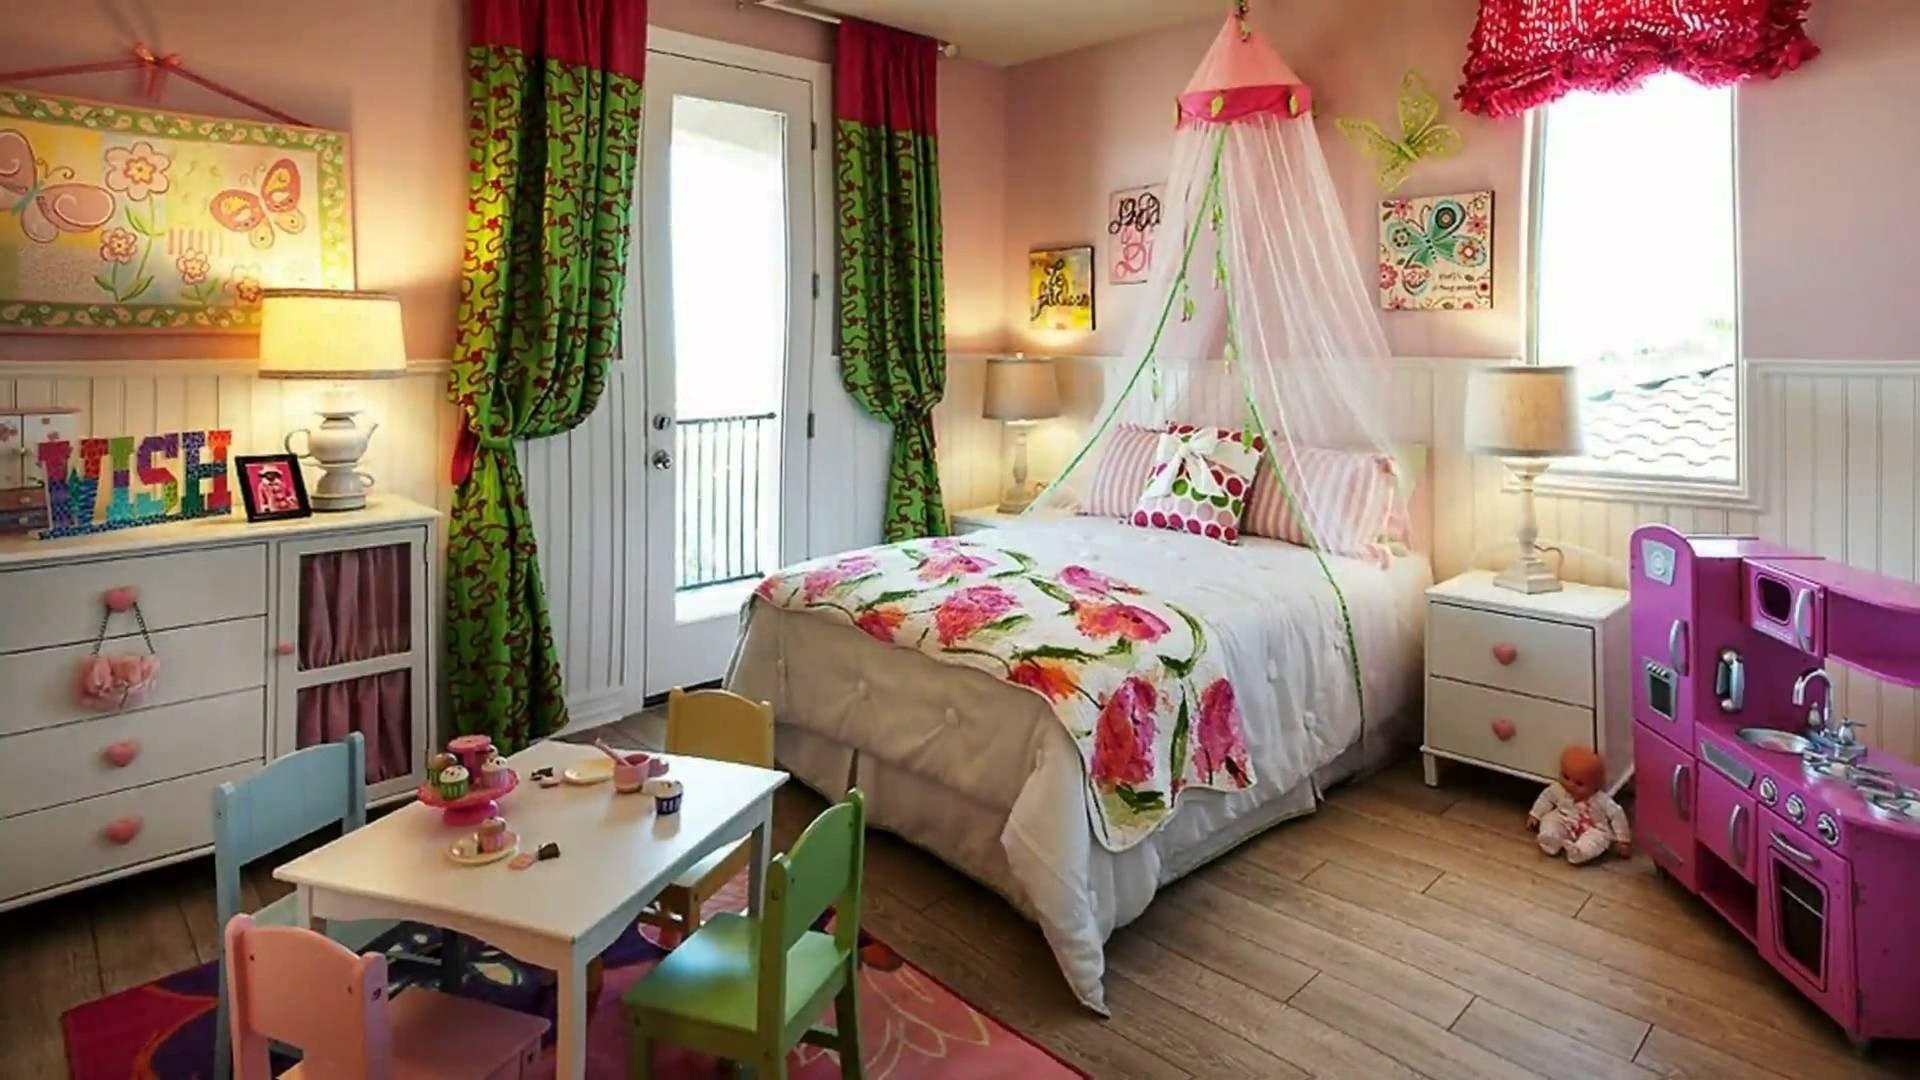 10 Nice Cute Little Girl Room Ideas cute bedroom ideas for little girls youtube 2020